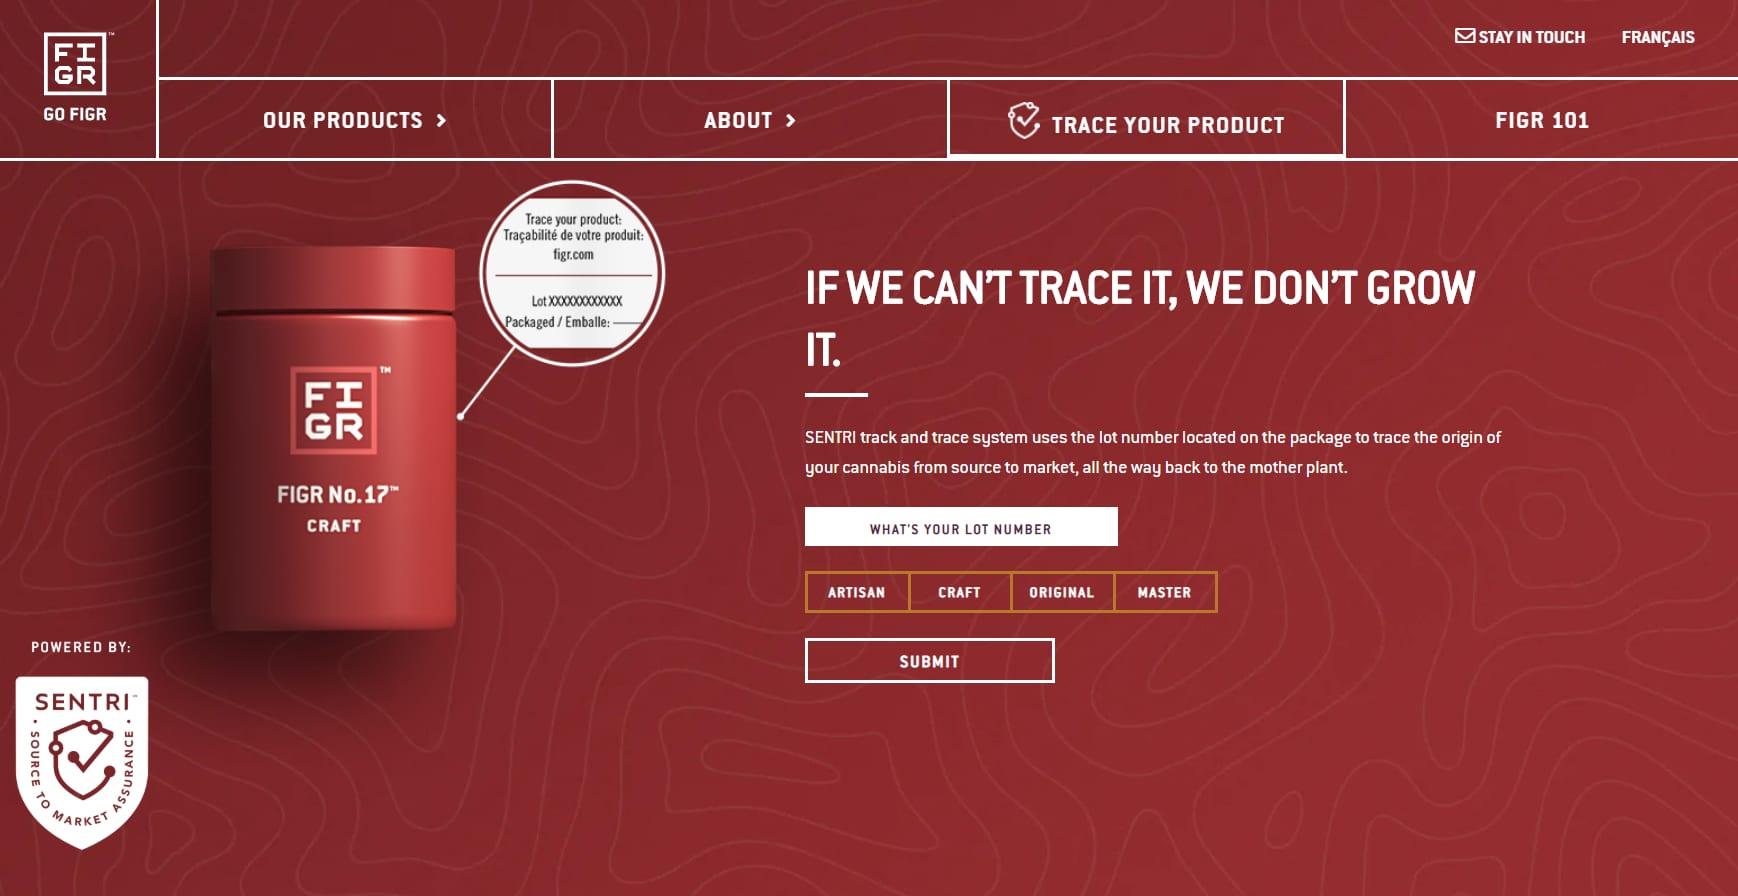 Online sales BC survey Figr Brands